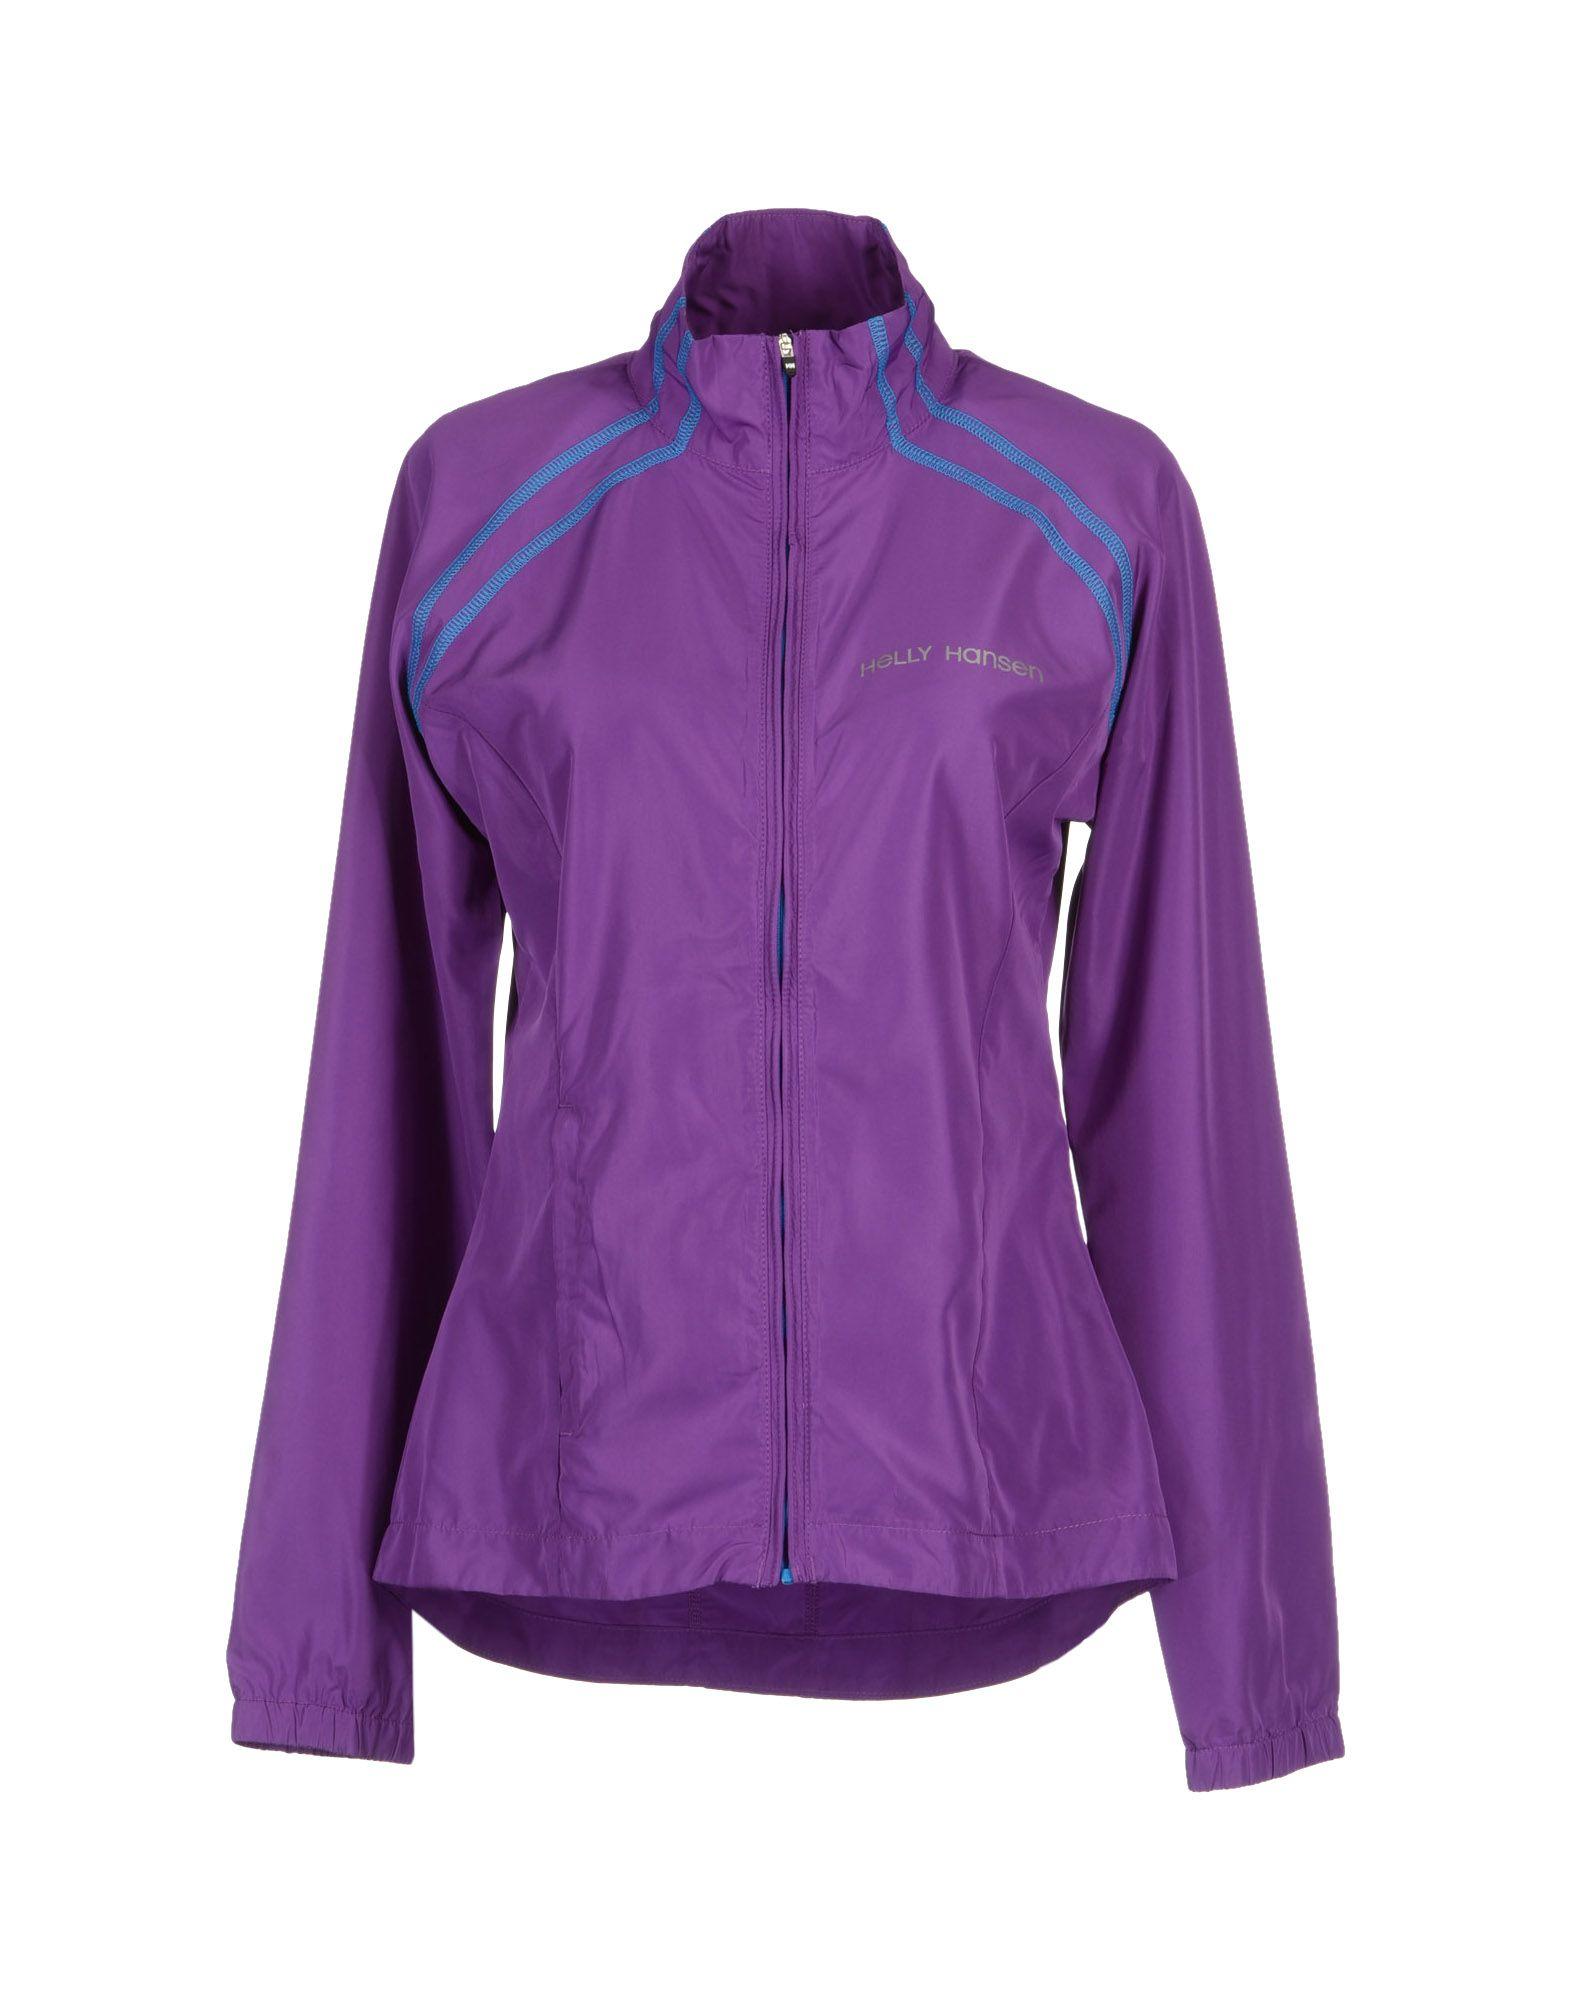 helly hansen zip sweatshirt in purple lyst. Black Bedroom Furniture Sets. Home Design Ideas